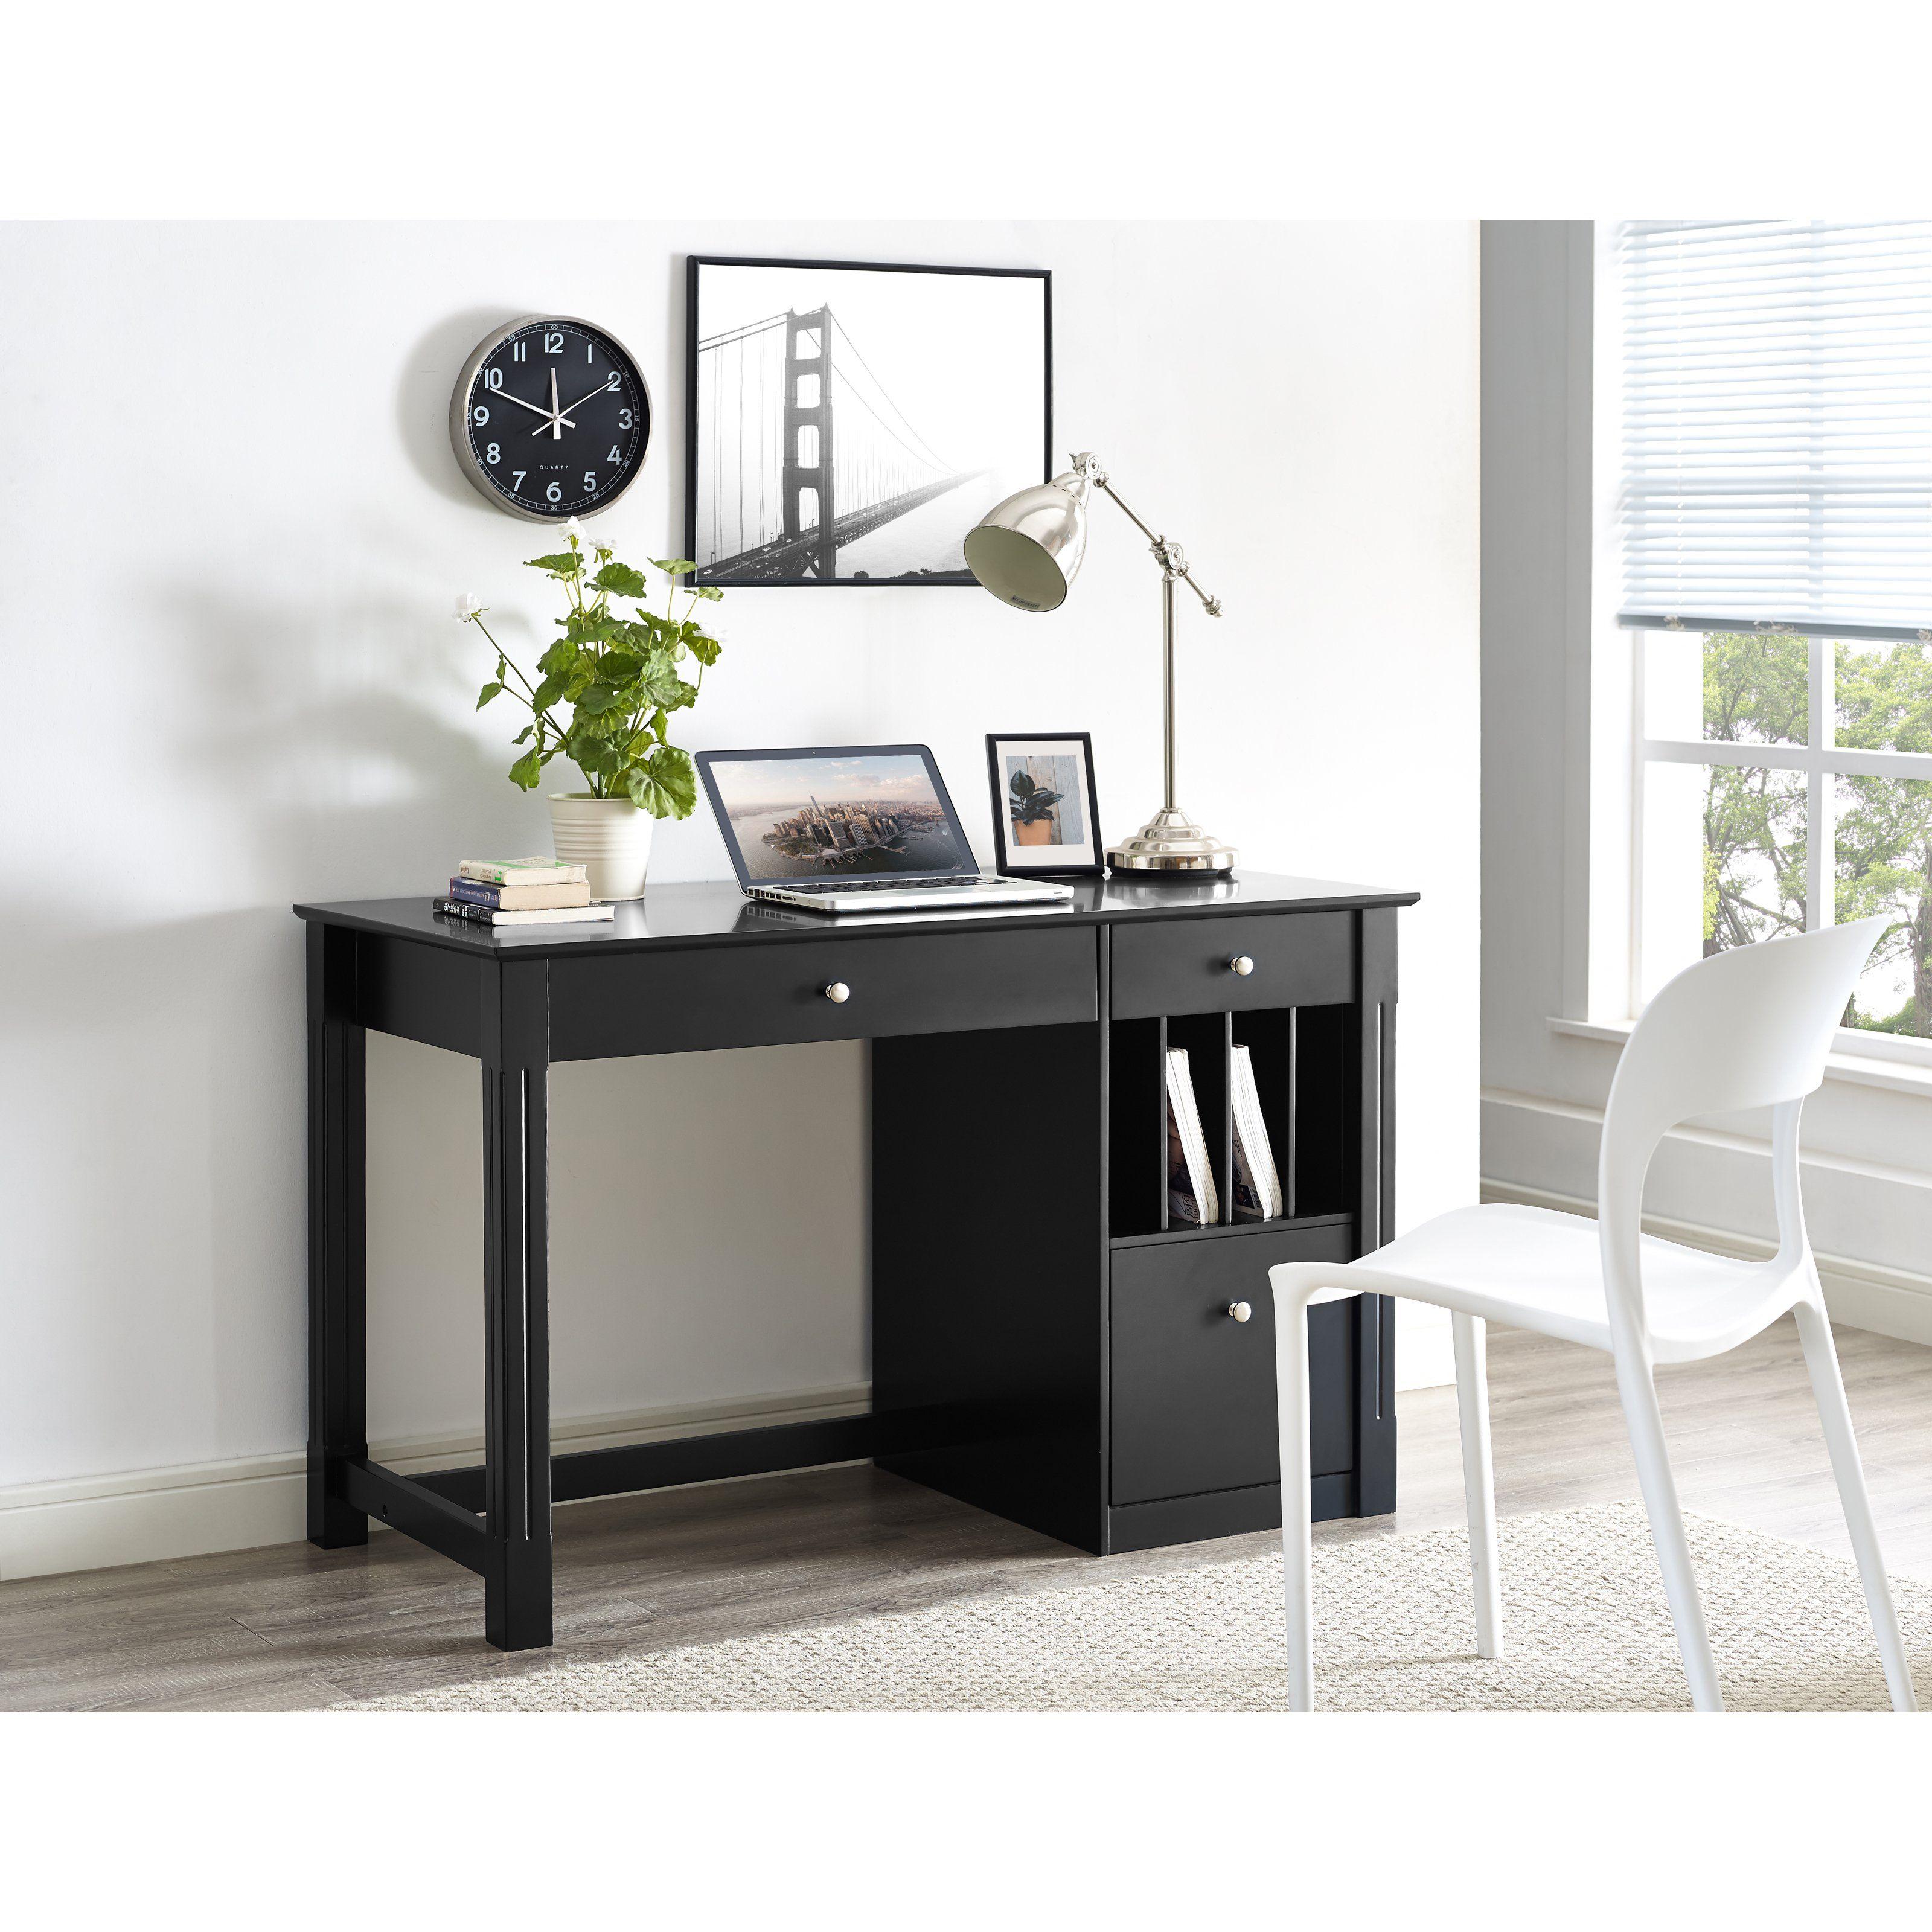 Walker Edison Home Office Deluxe Wood Storage 48 In